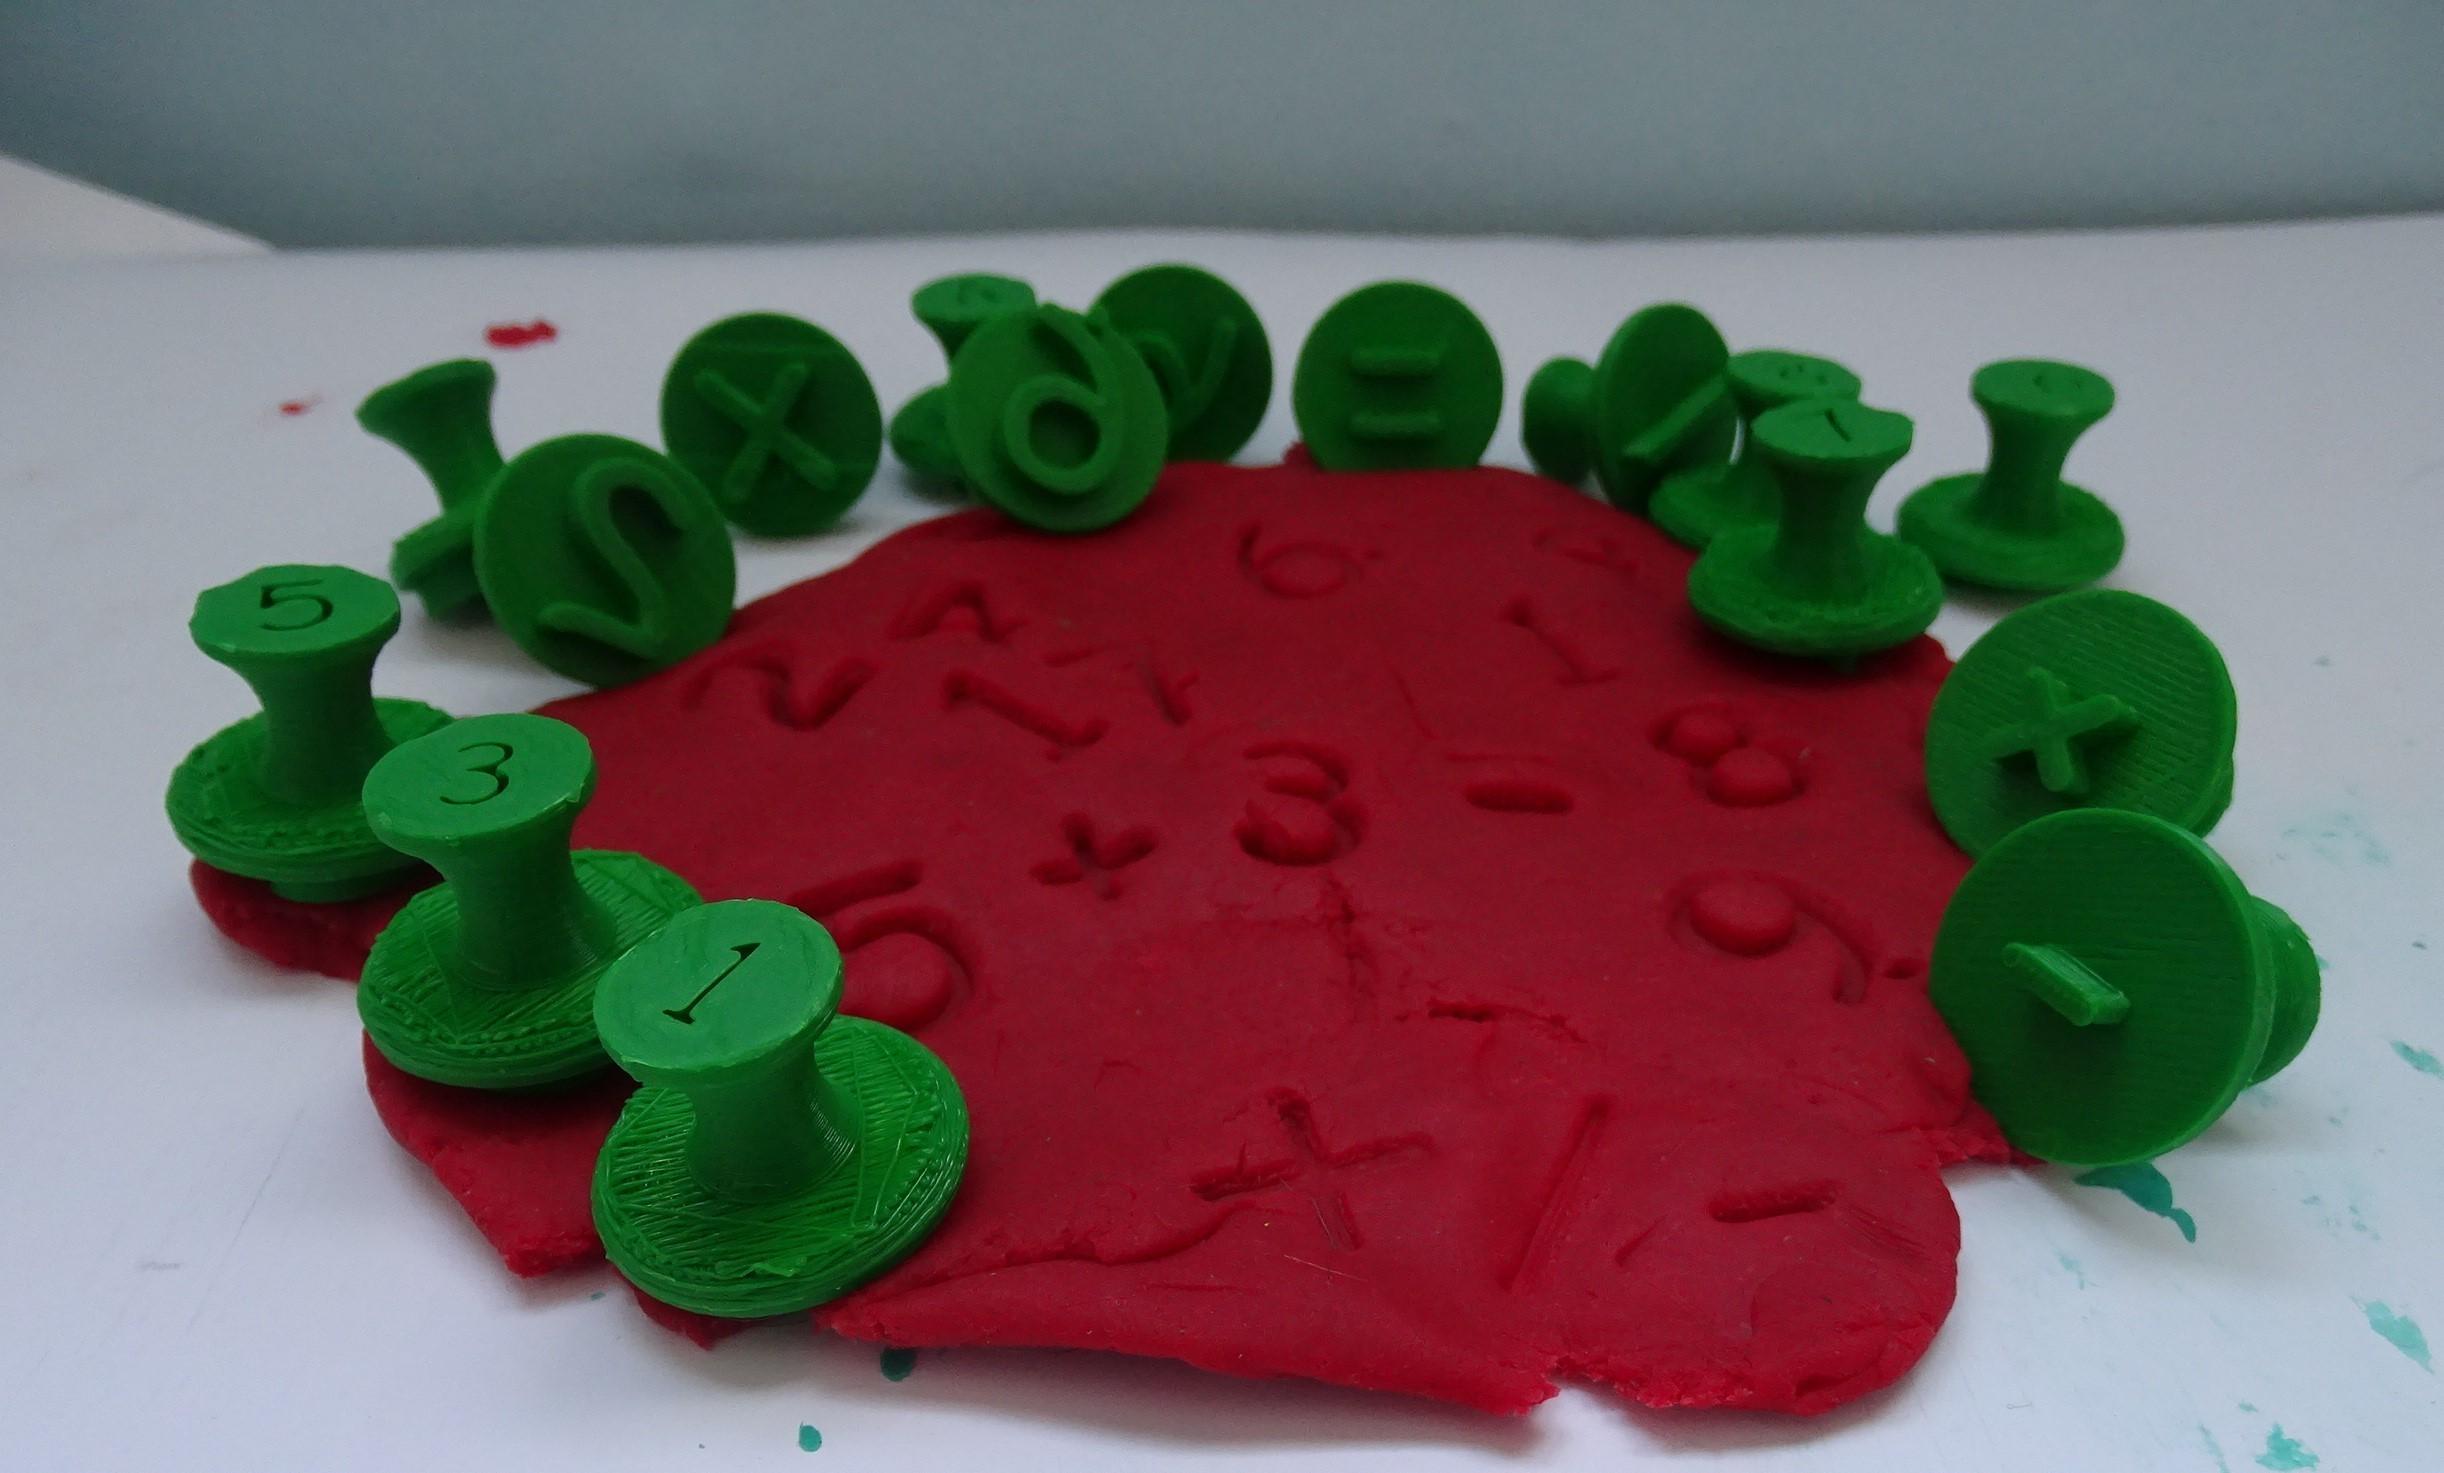 Tamons chiffres 1 _.jpg Download free STL file Stamps stamps number _ Number plasticine stamps • 3D printer model, LaWouattebete